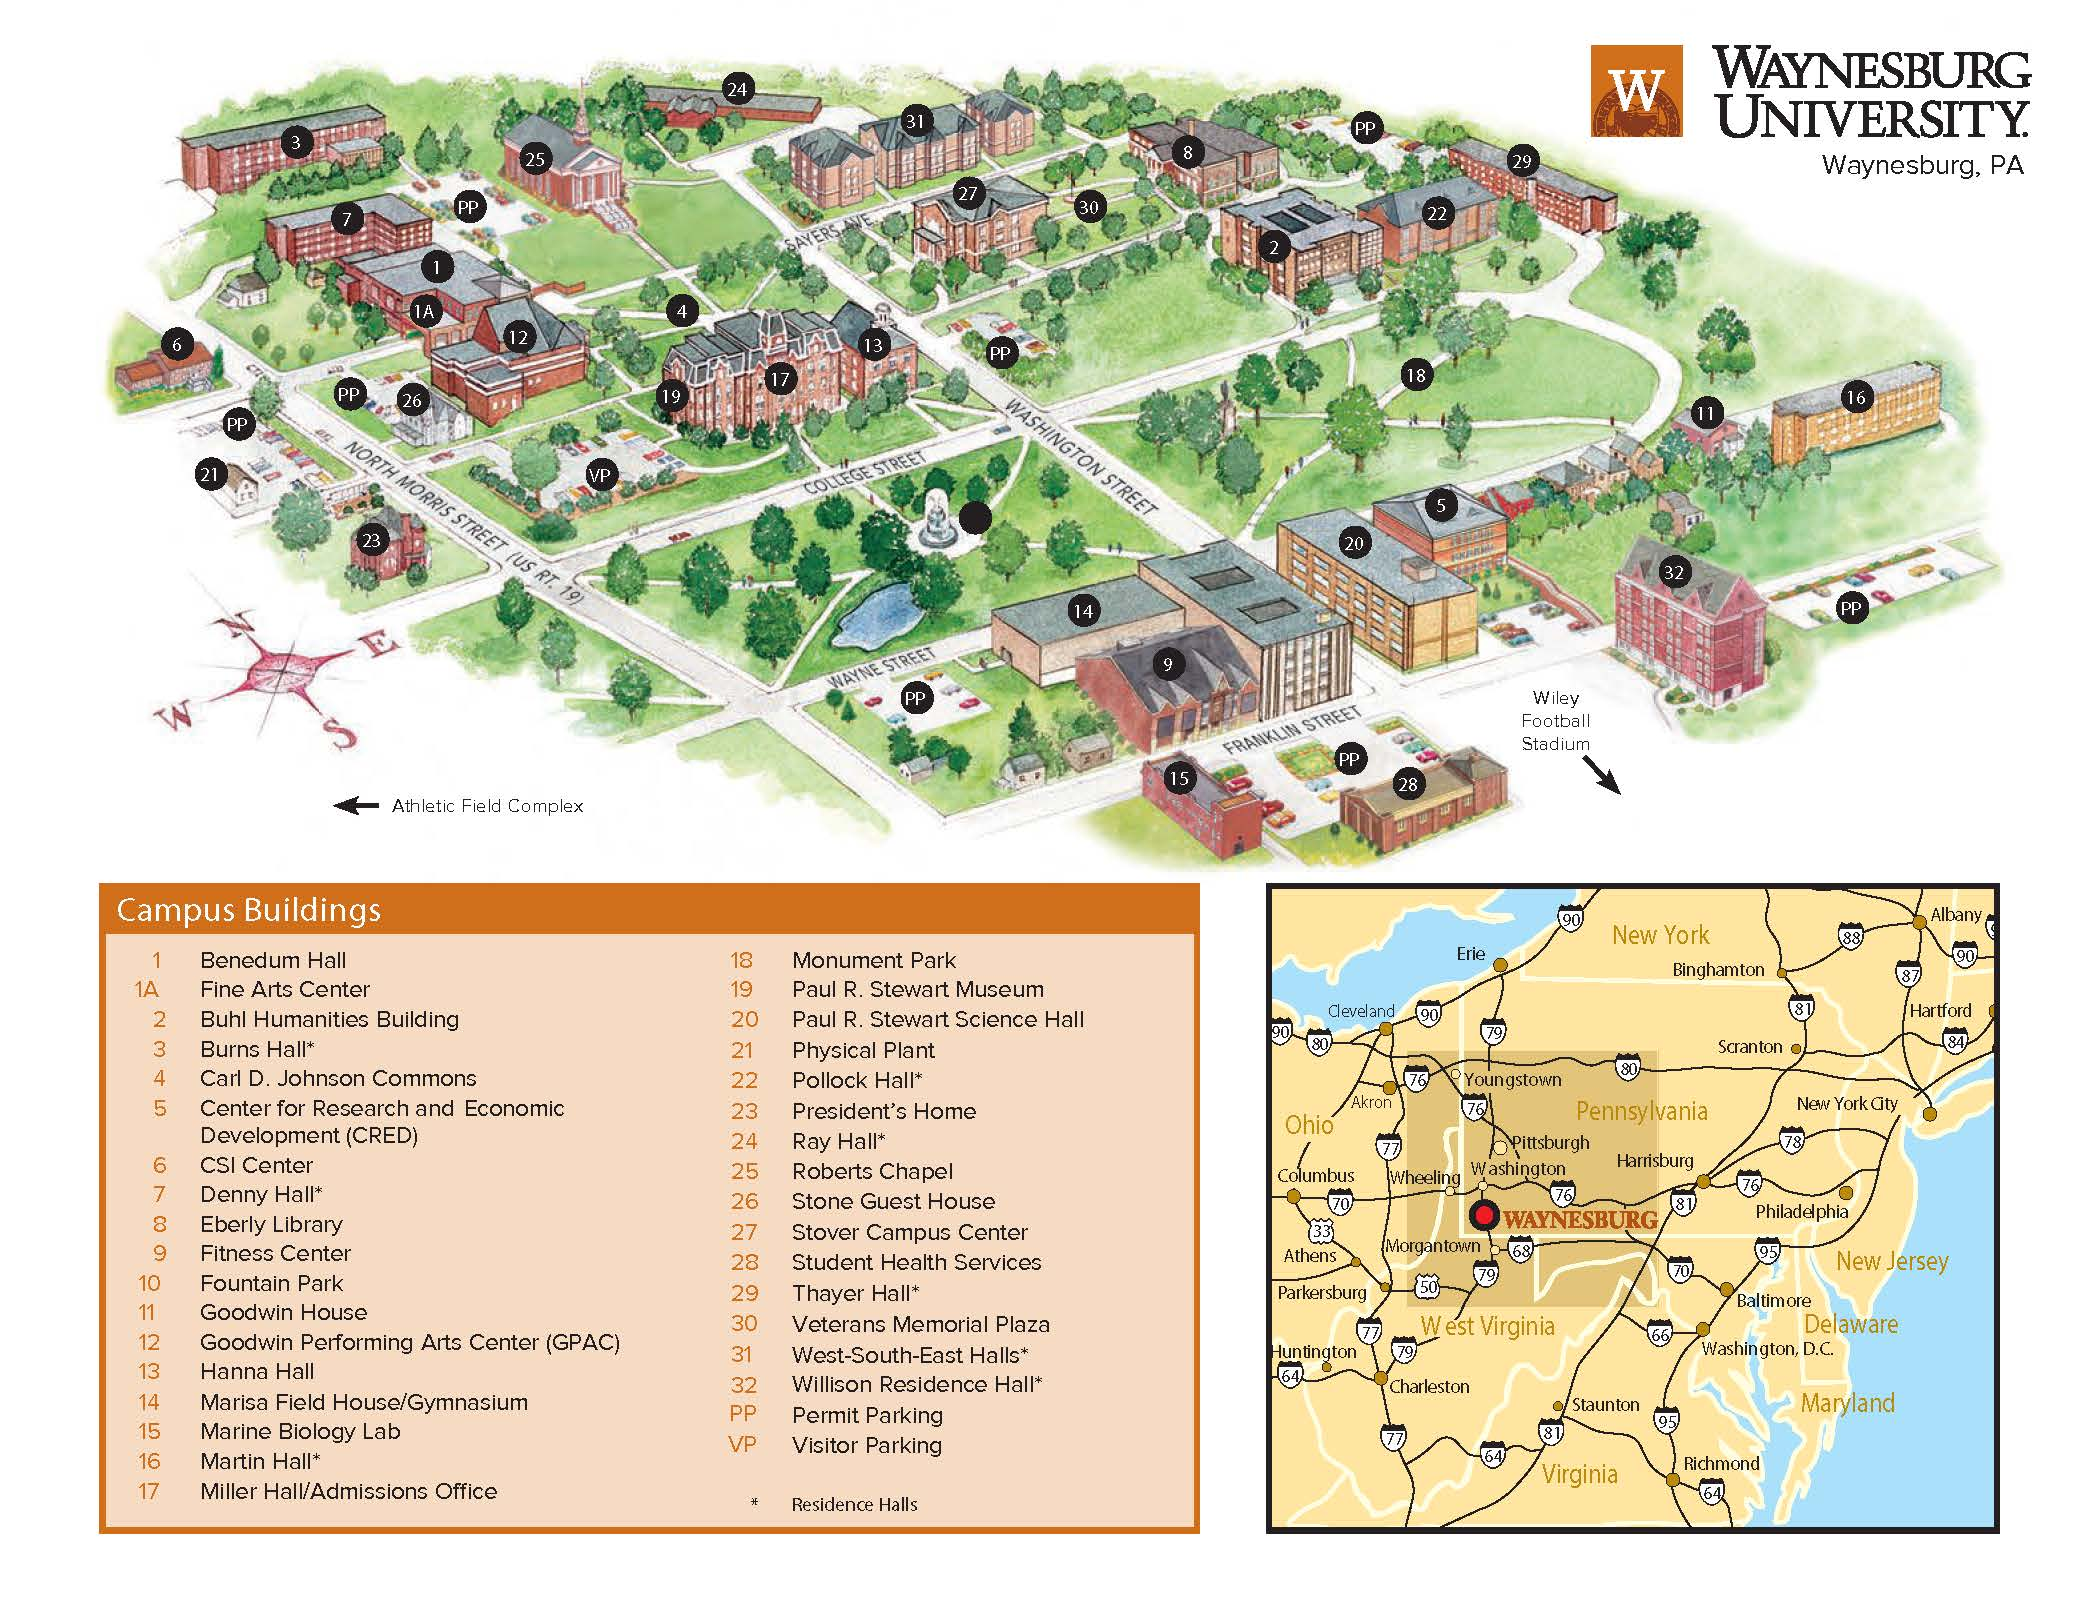 Waynesburg University | Locations and Campus Map